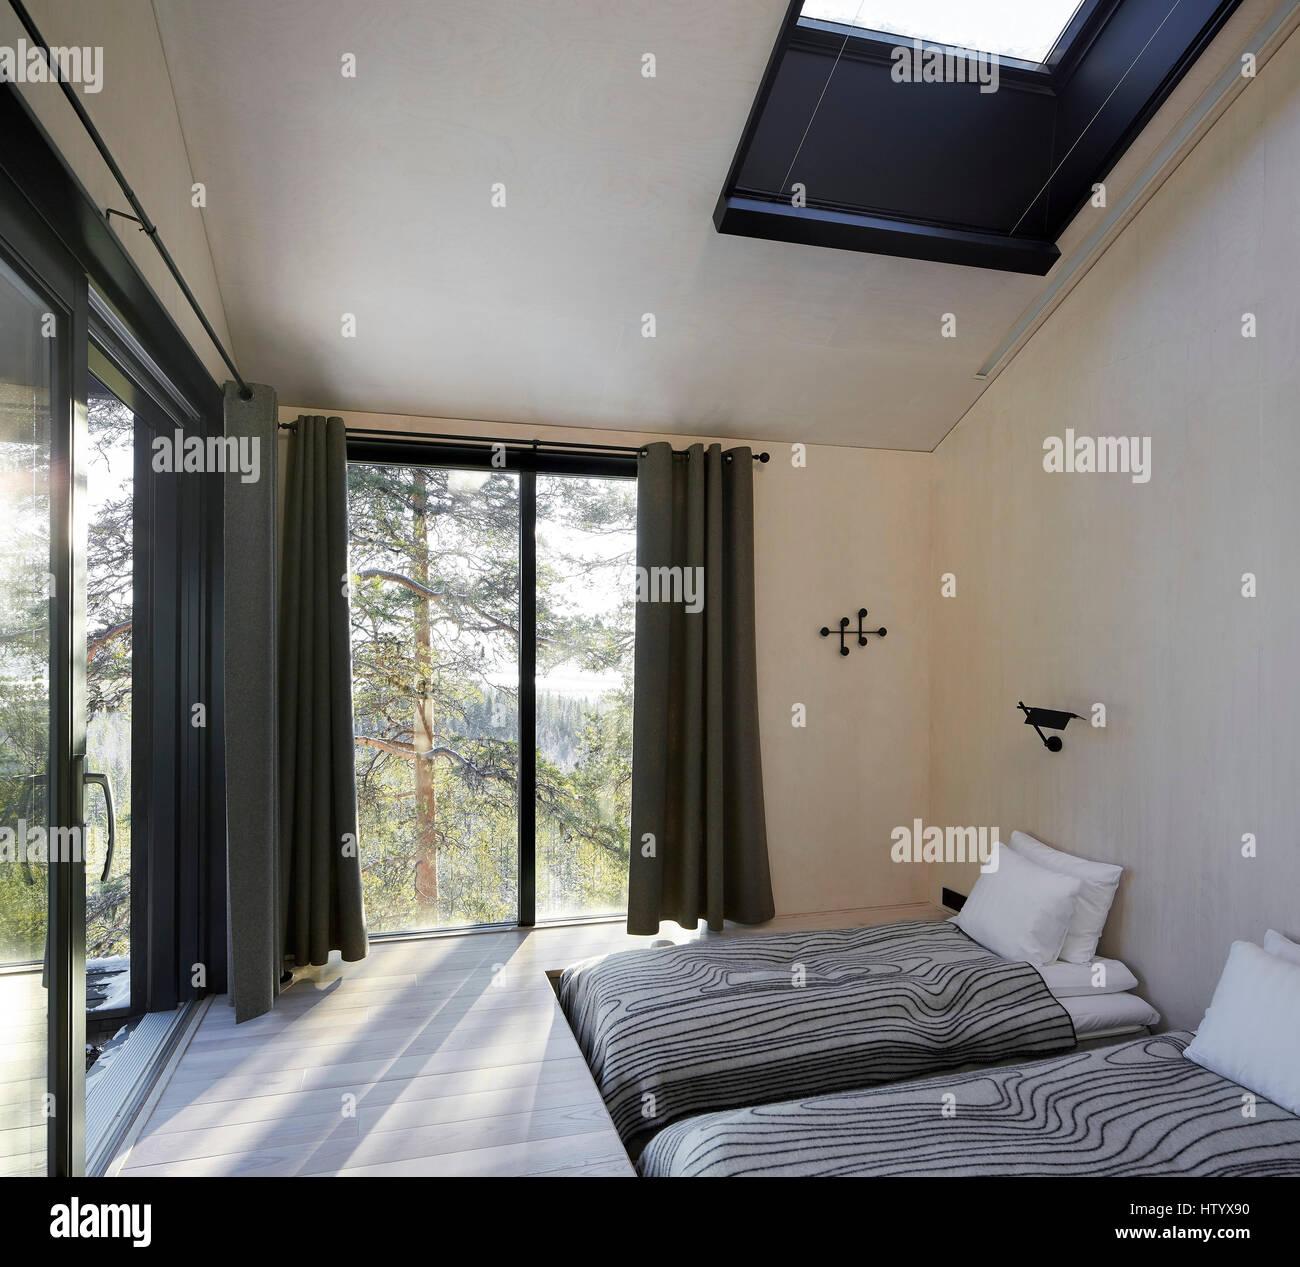 Camera Da Letto In Rodano Alberi Treehotel Harads Svezia